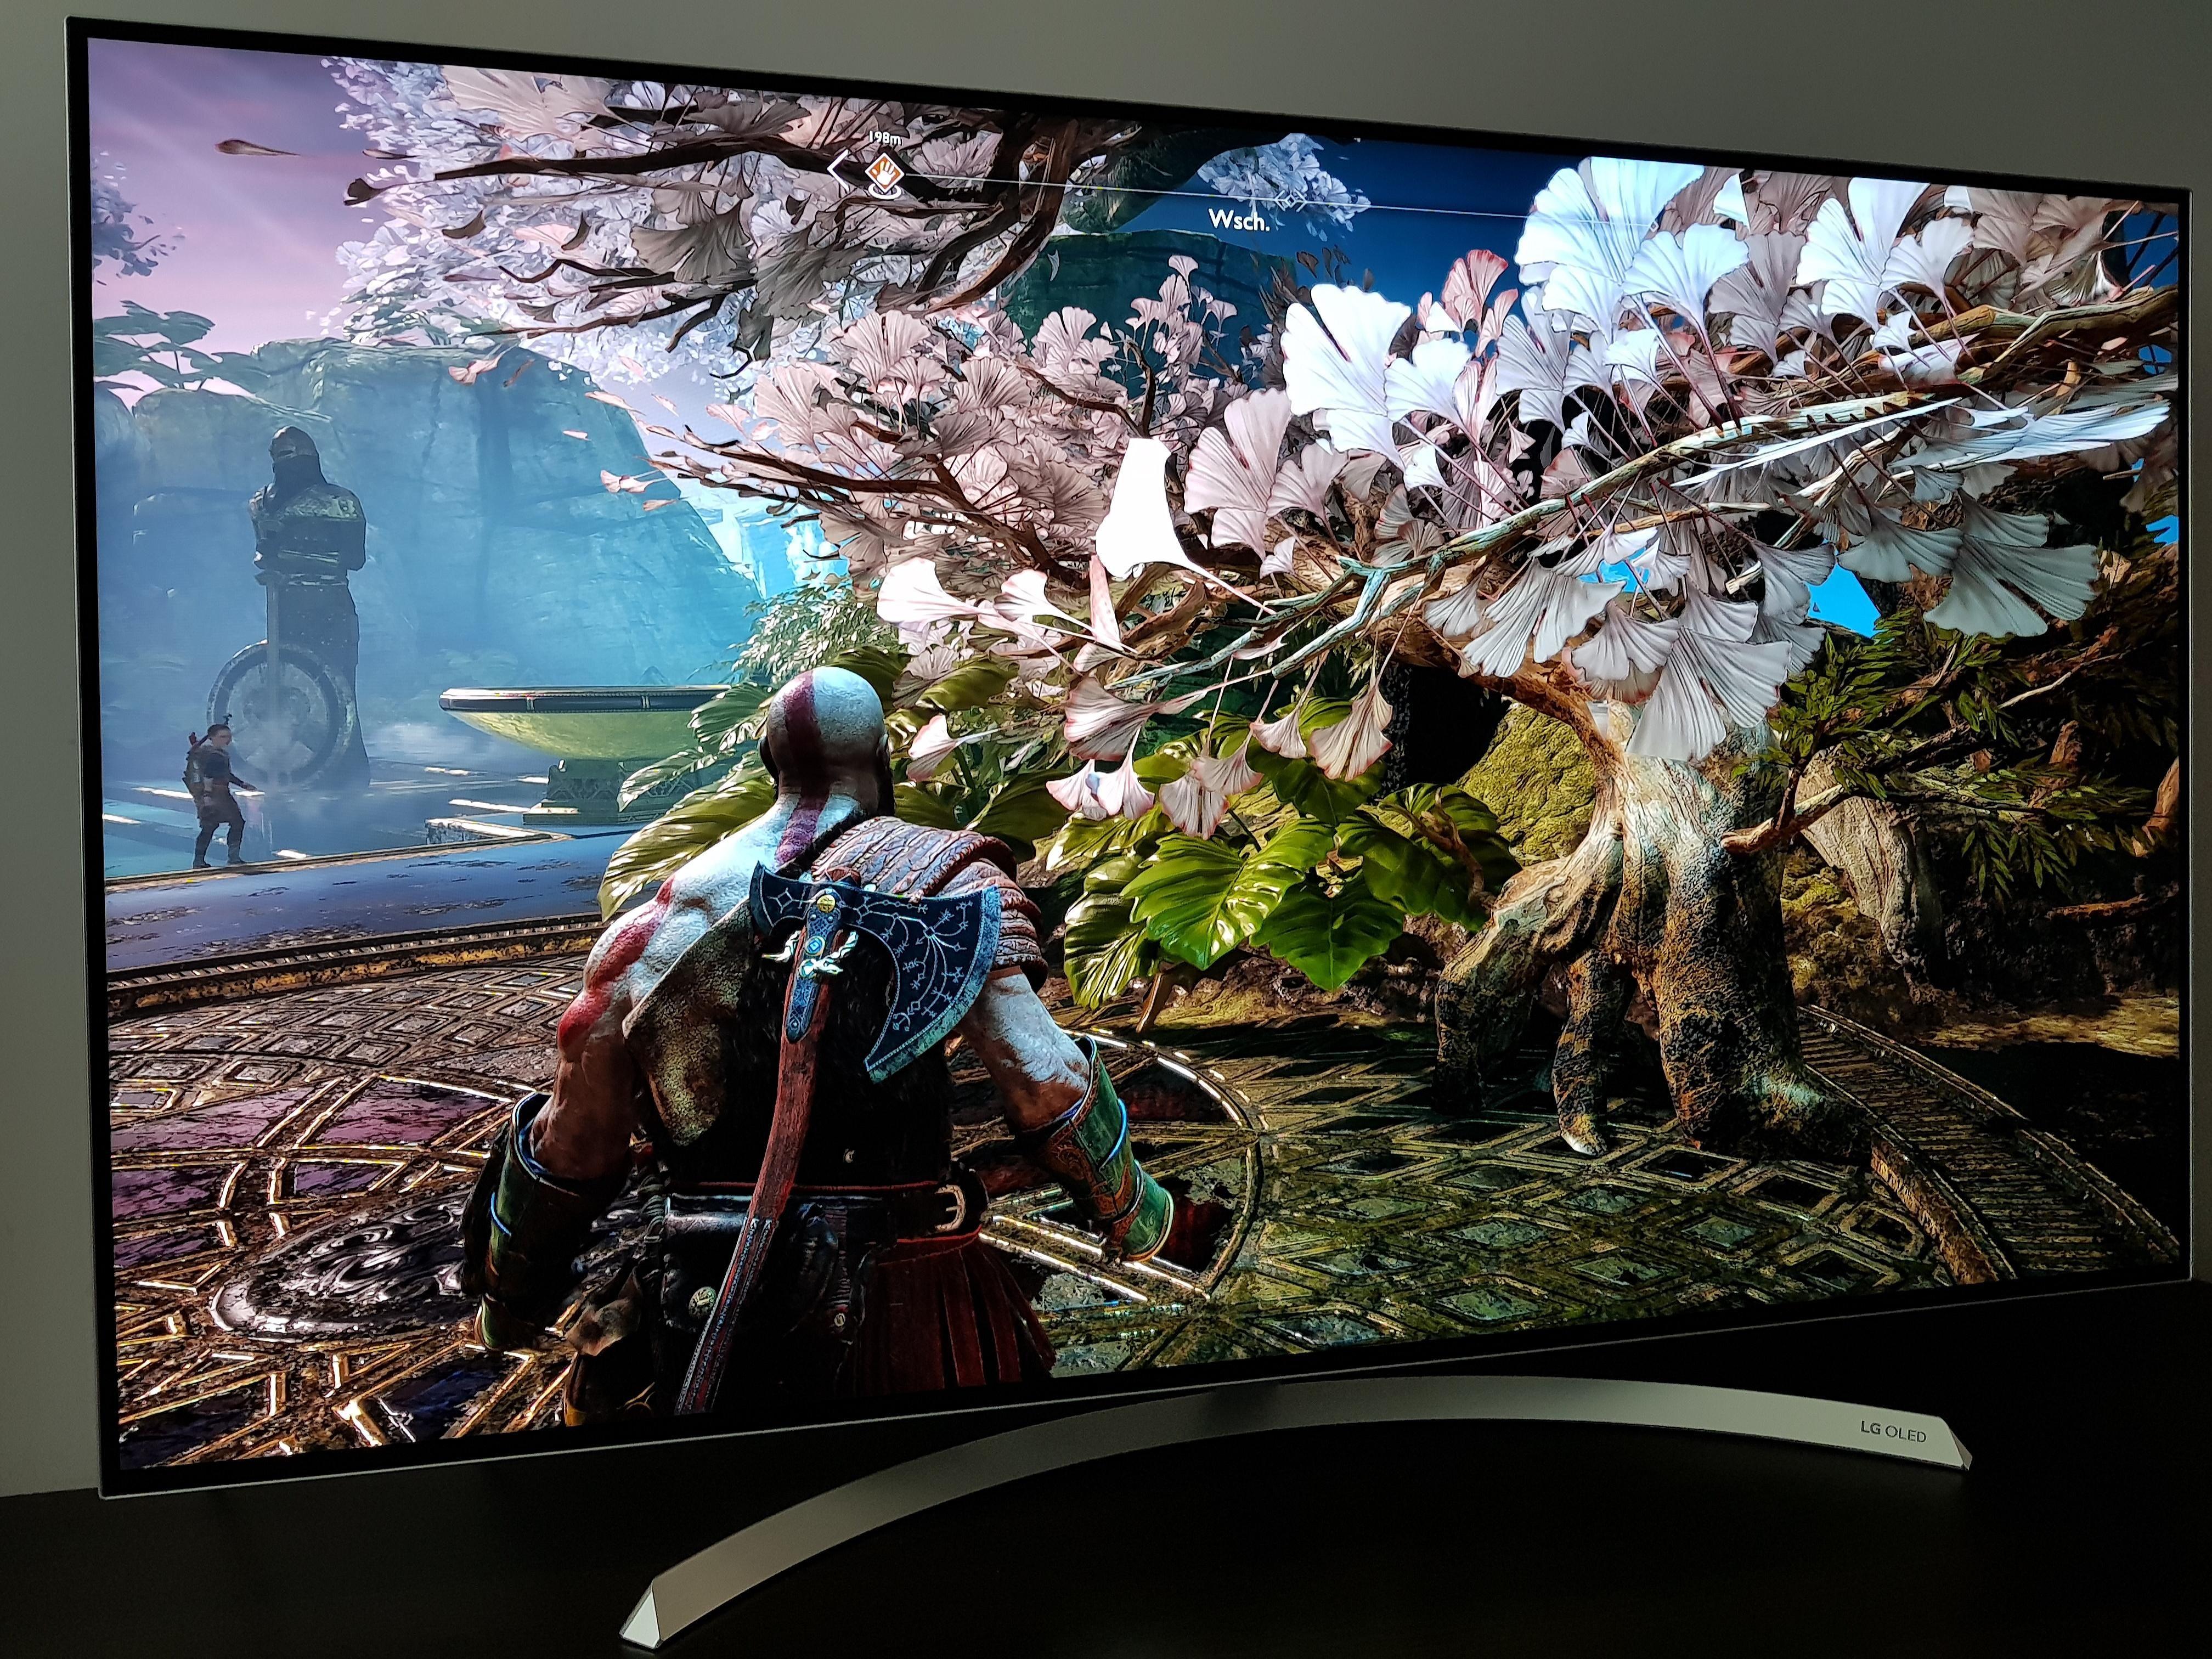 God of War on OLED TV looks insane